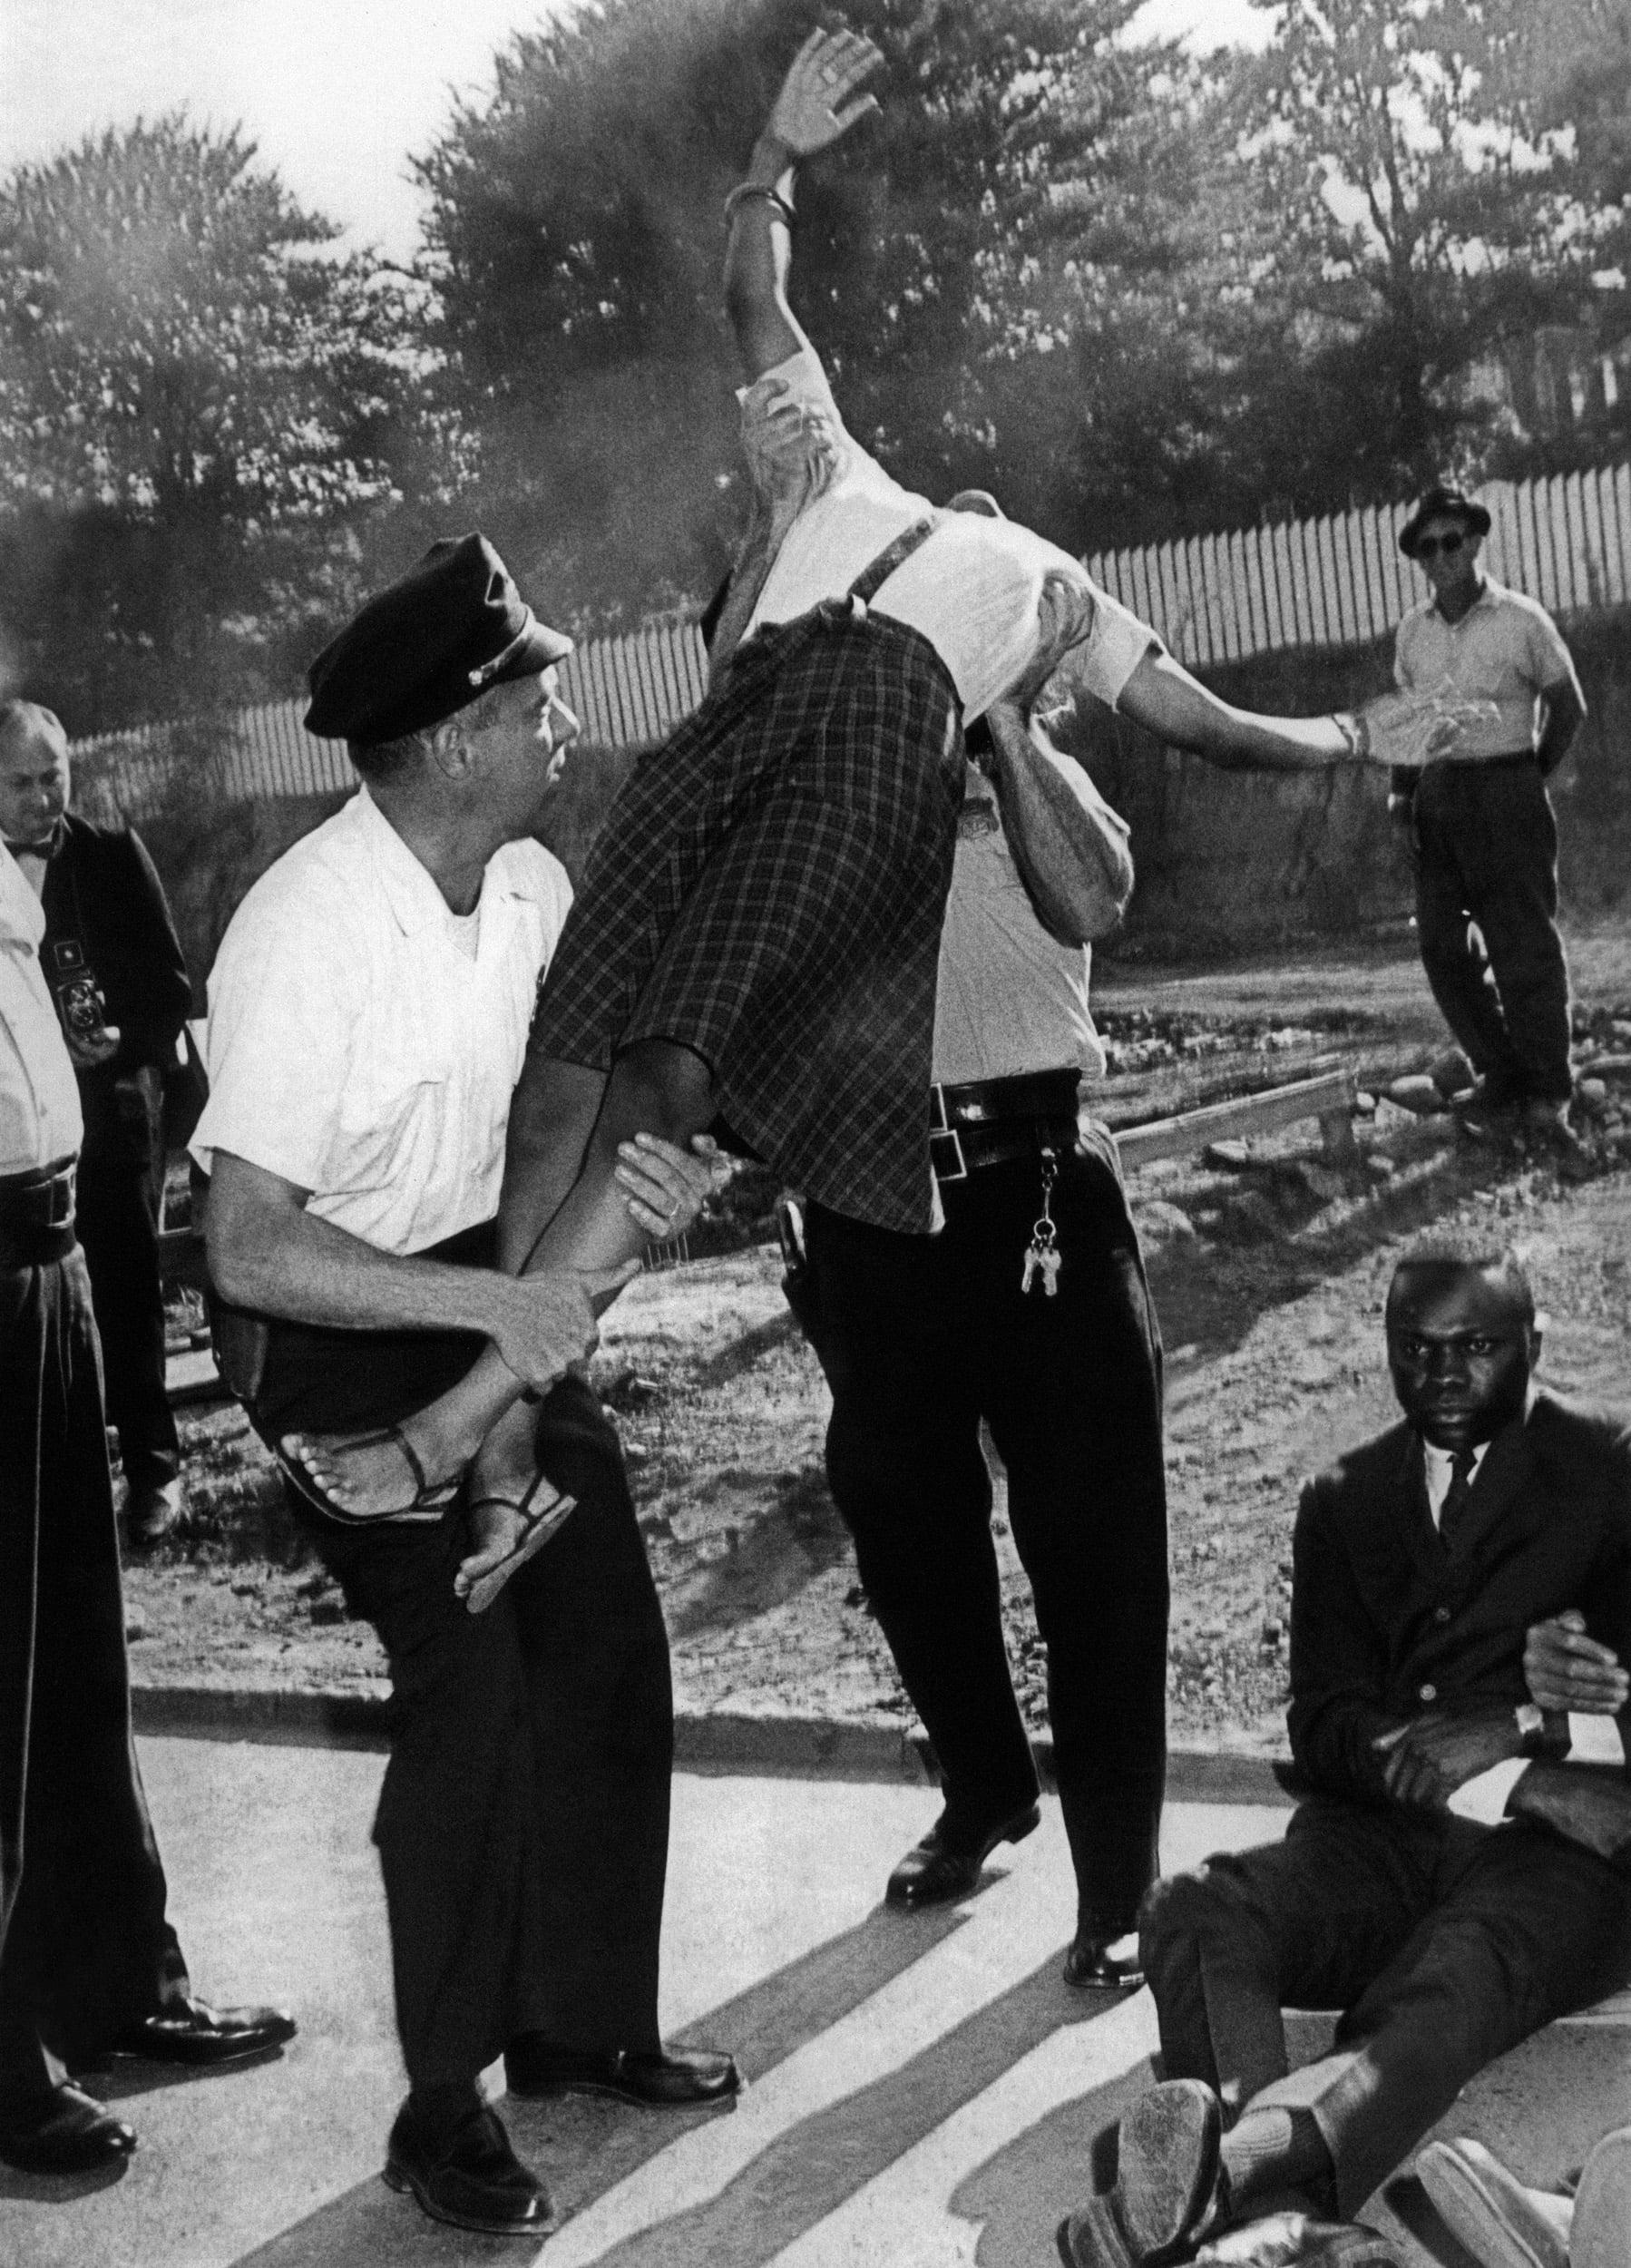 Civil Rights in US, 1963